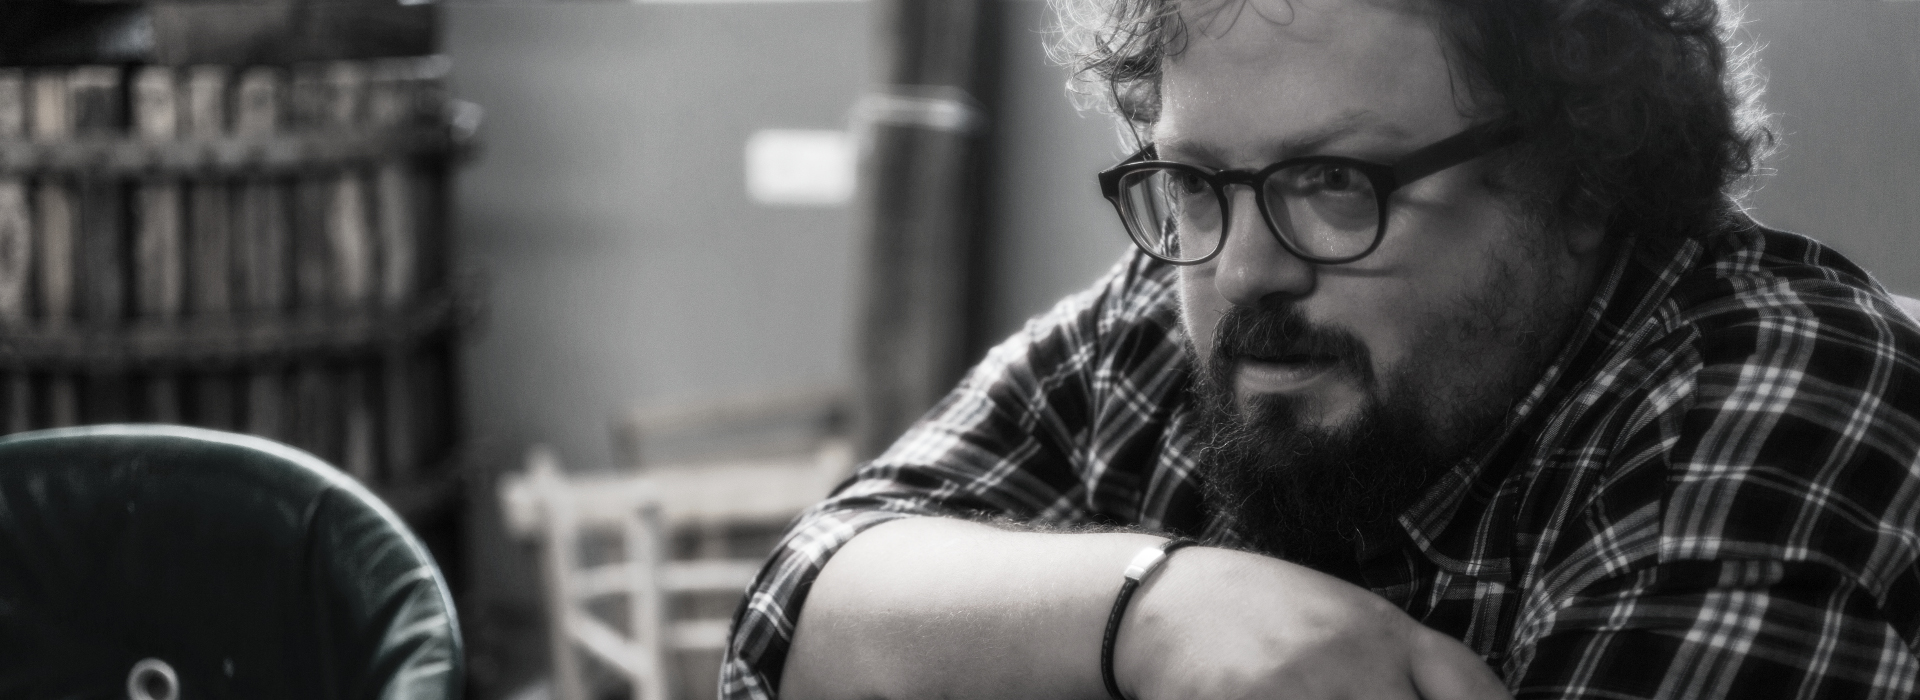 Fabio Curzi - Digitale e varie umanità